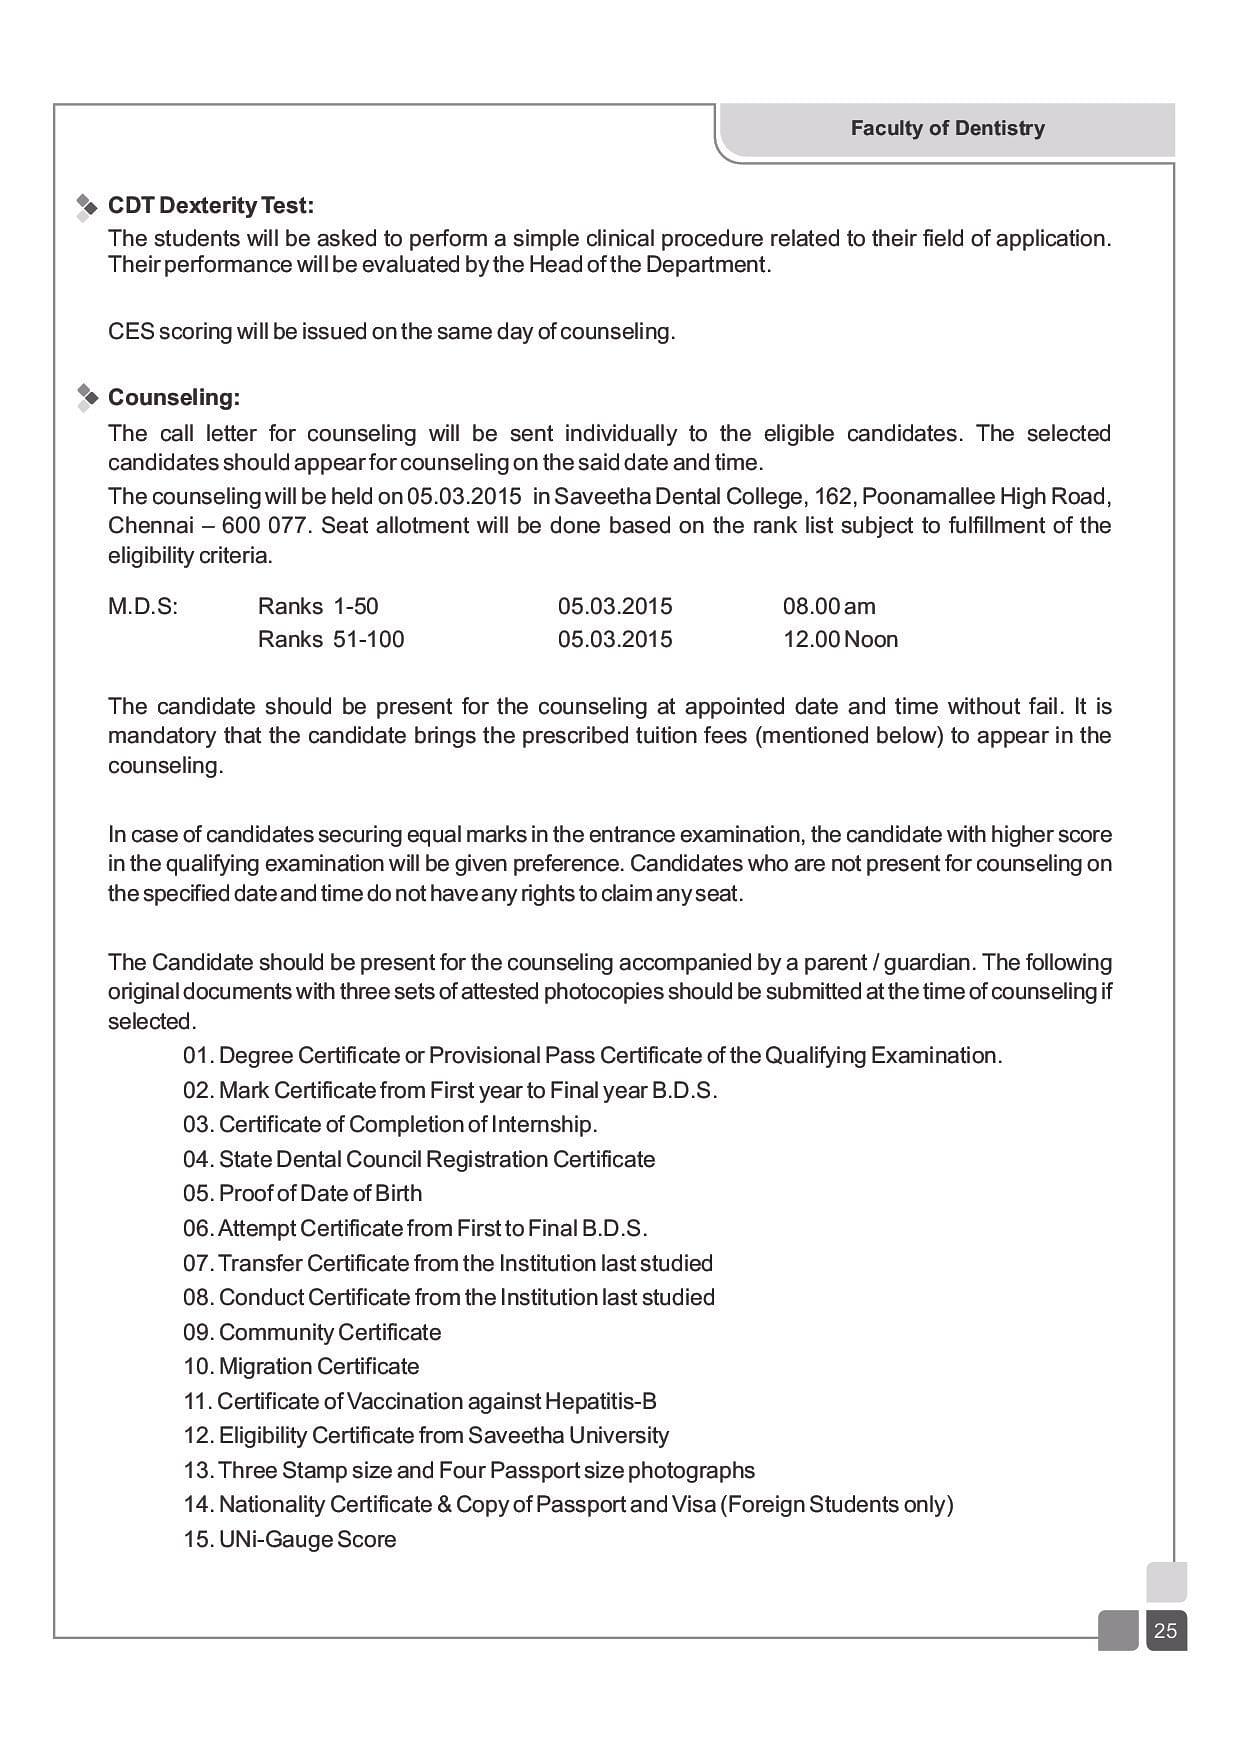 Saveetha dental college hospital chennai admissions contact 2016mds prospectus aiddatafo Images